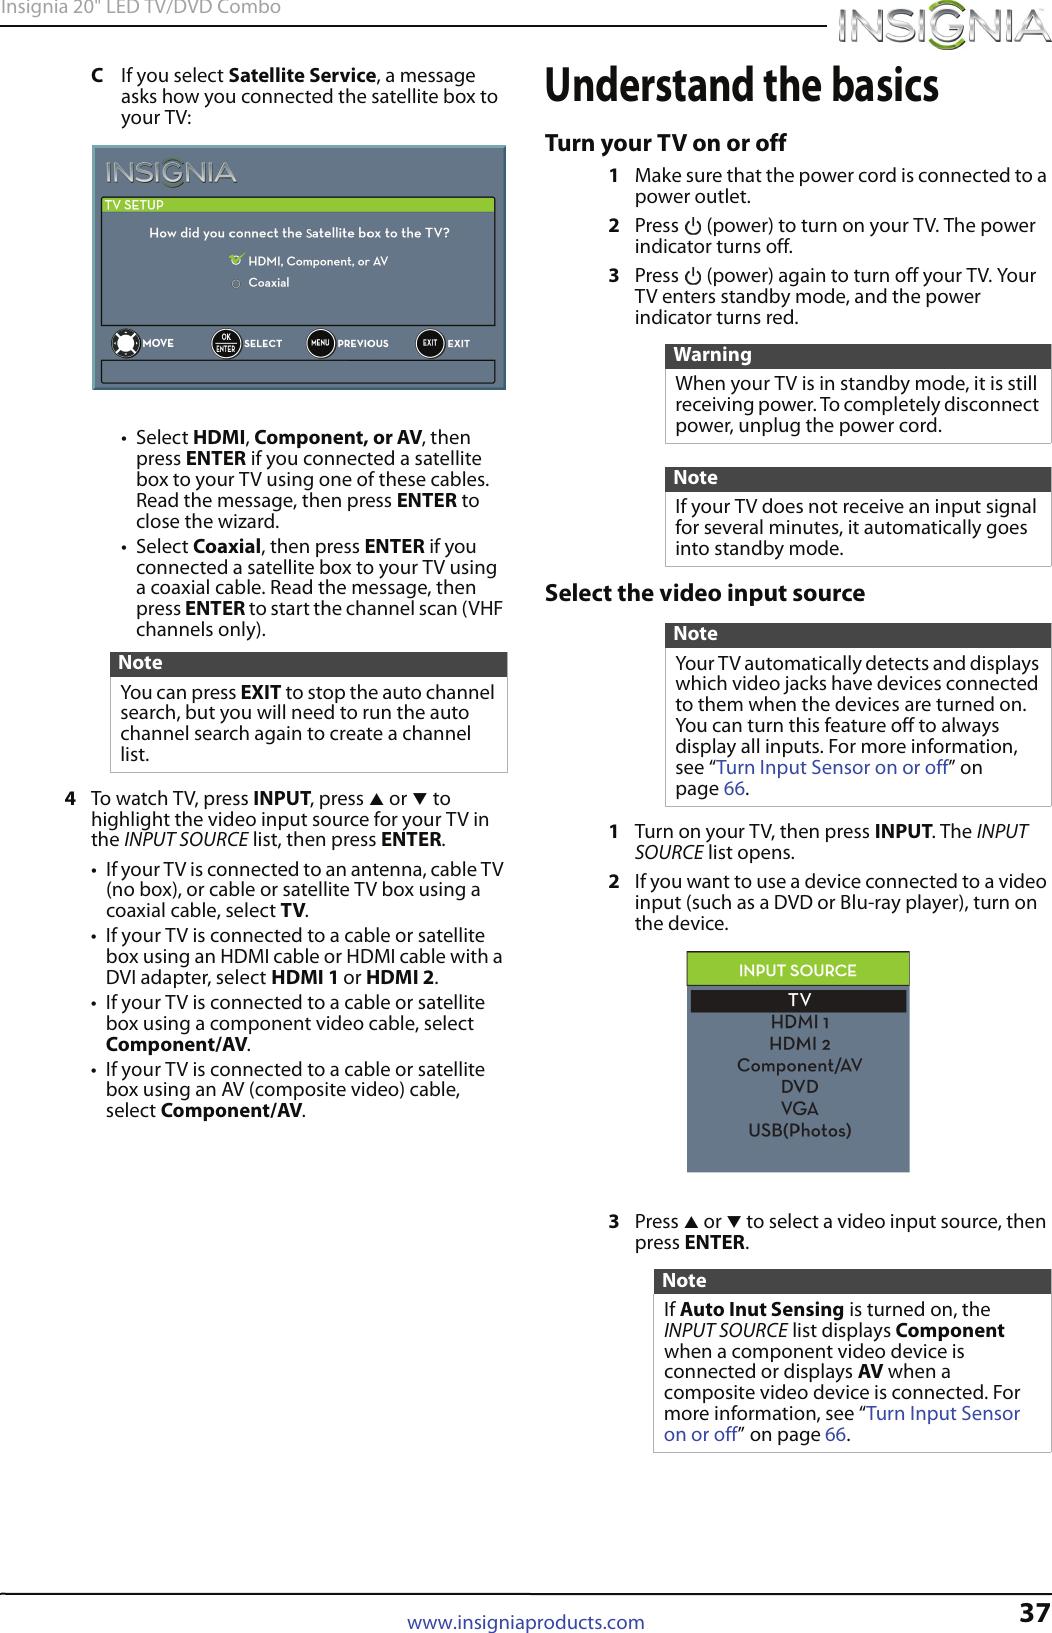 Insignia 20Ed310Na15 Users Manual NS 20ED310NA15_13